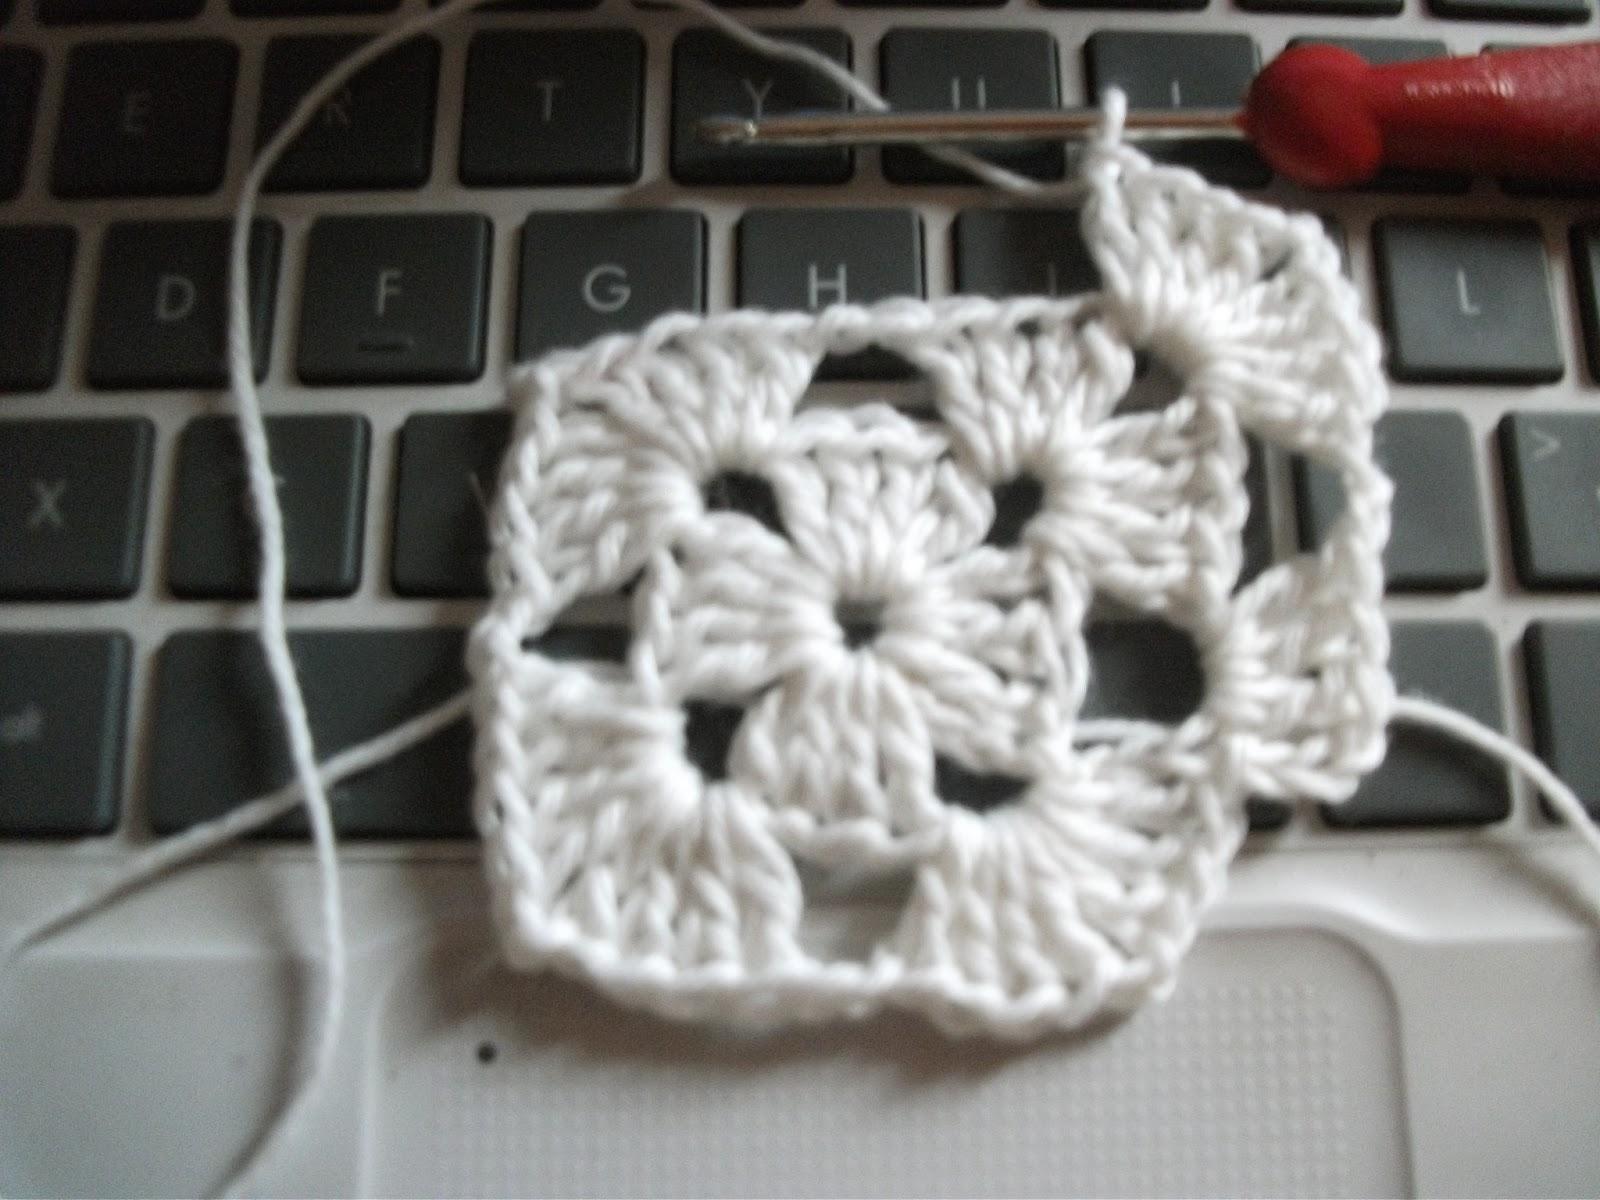 dos chalecos a crochet para tejer gratis paso a paso todo patrones crochet gratis paso a paso. Black Bedroom Furniture Sets. Home Design Ideas